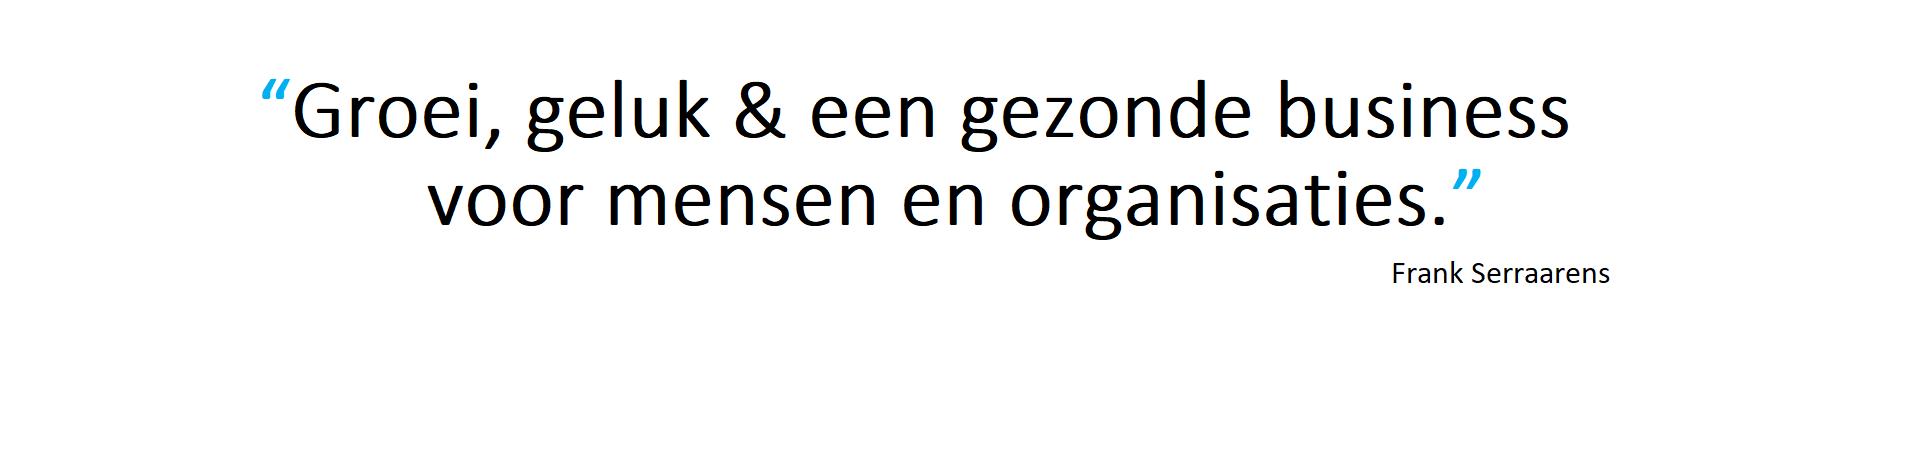 FrankSerraarens.nl